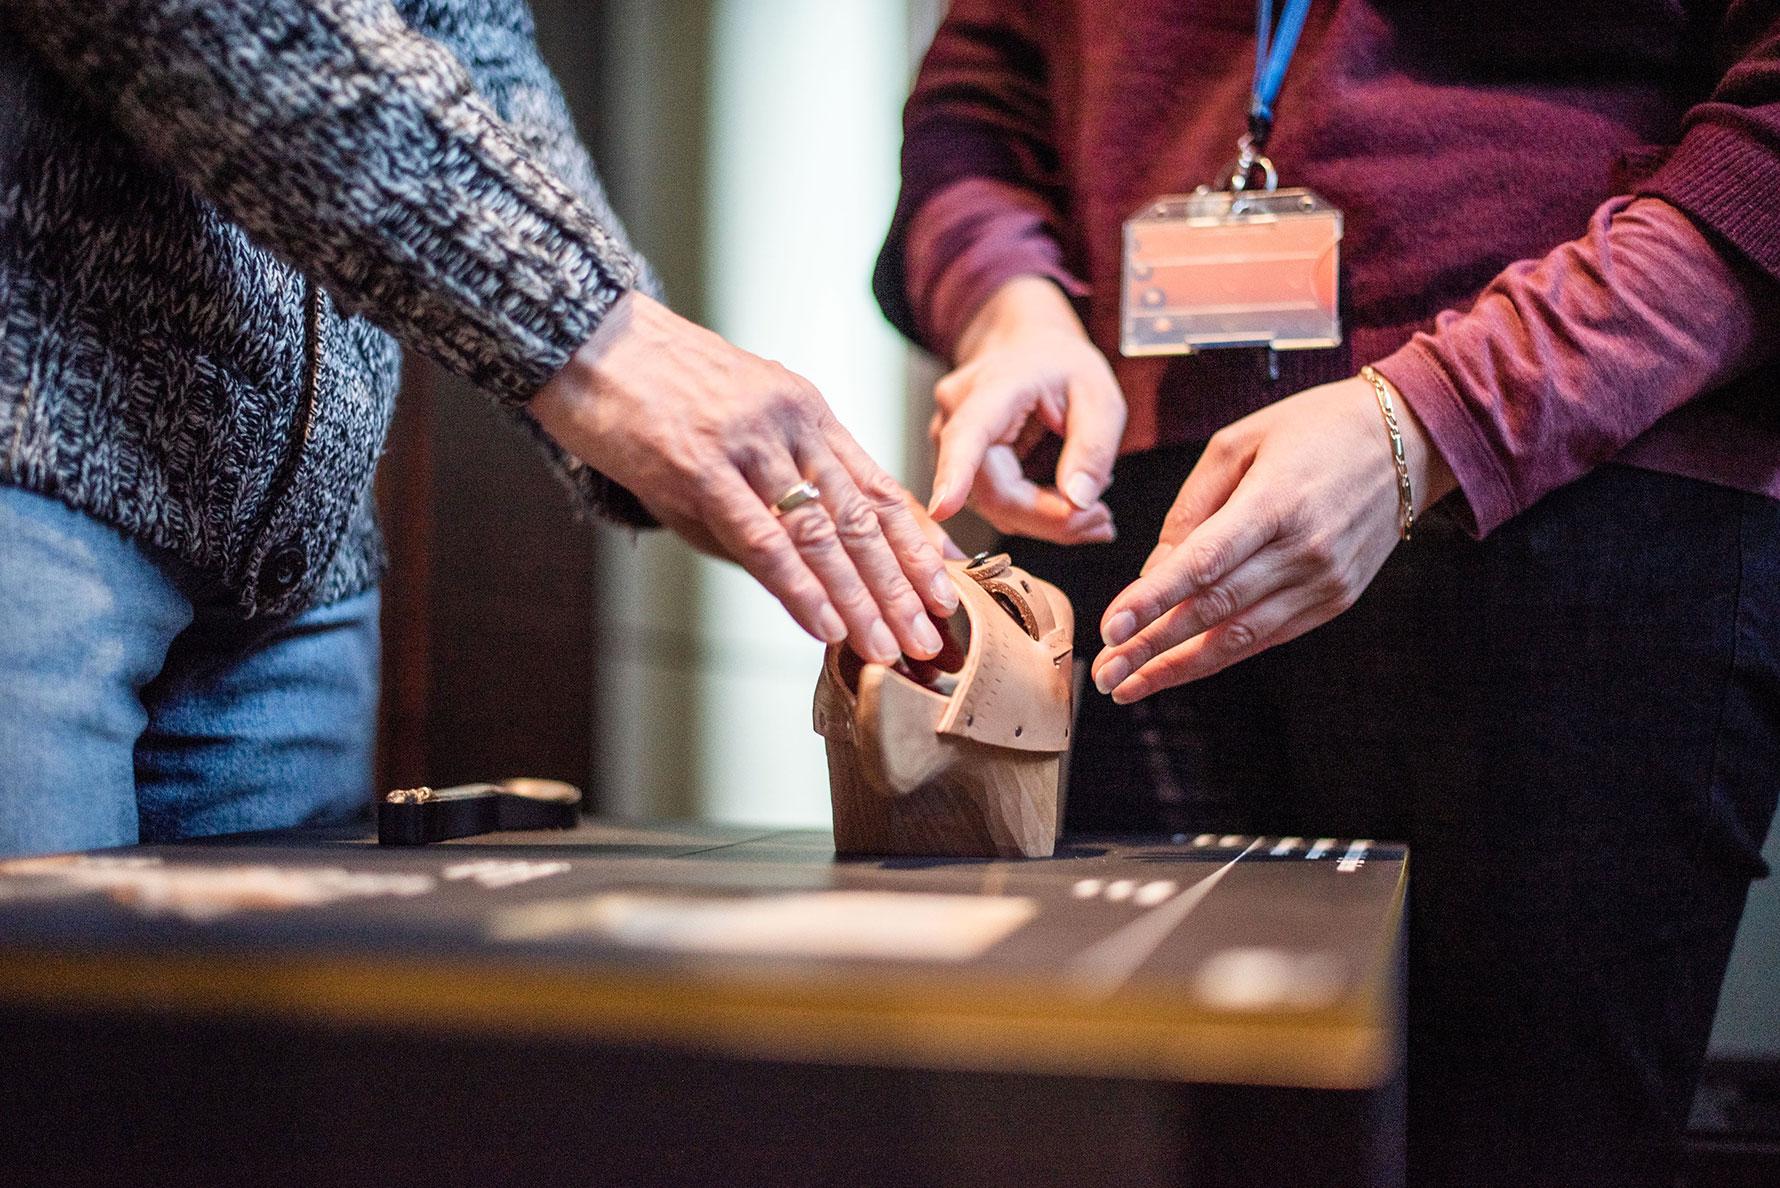 Ein Besucher entdeckt ein 3D-Artefakt im Gruuthusemuseum, Brügge - © Femke den Hollander